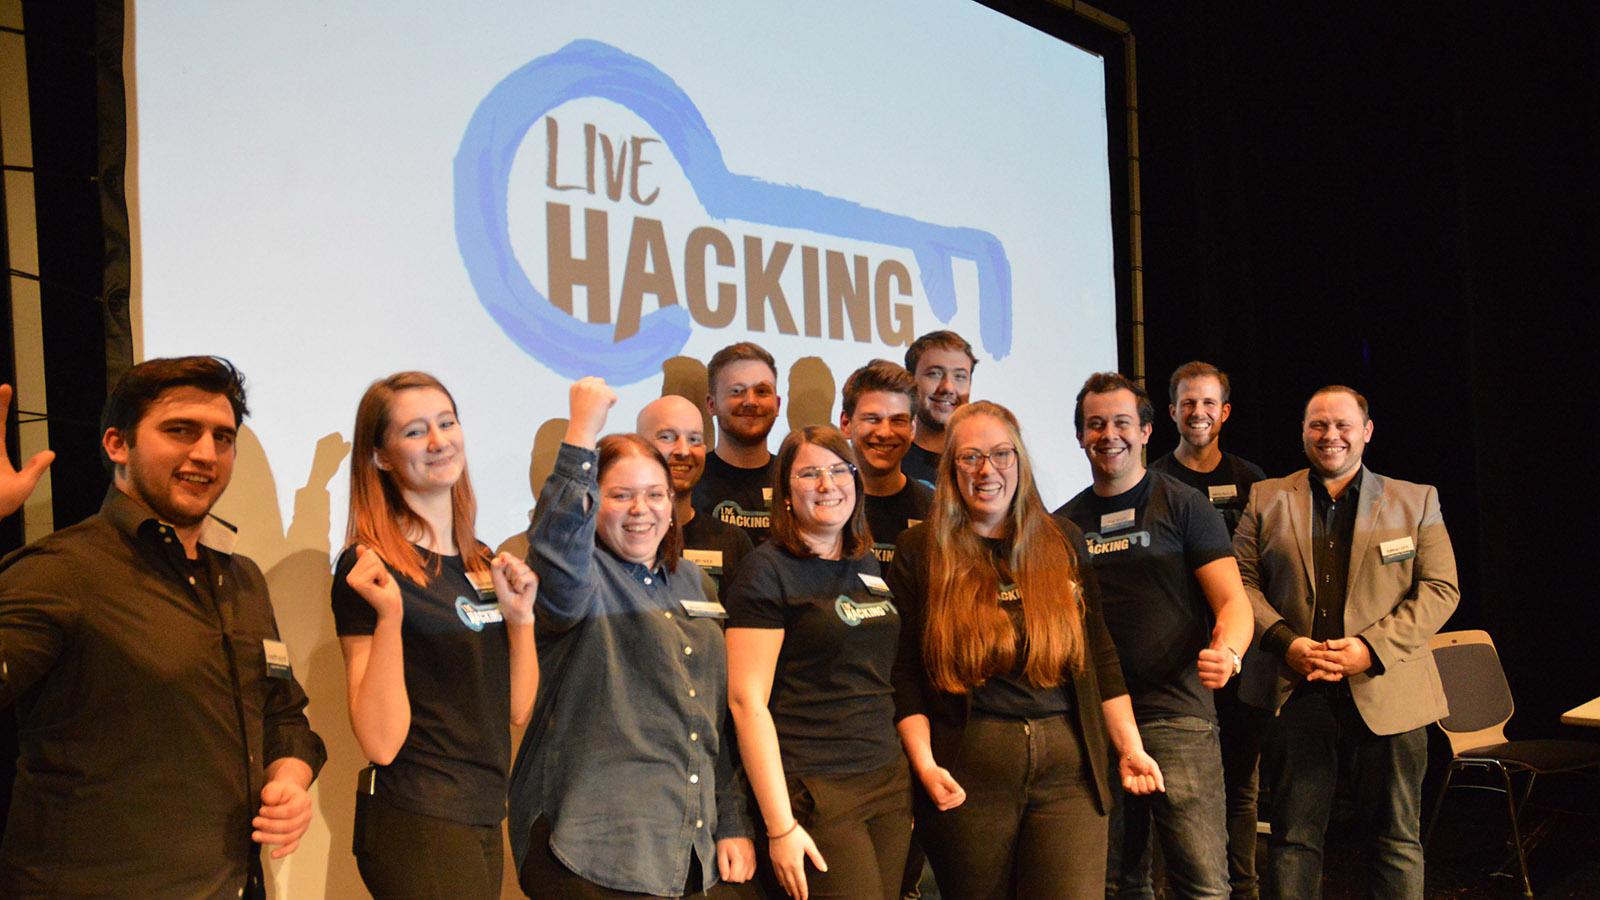 Live Hacking